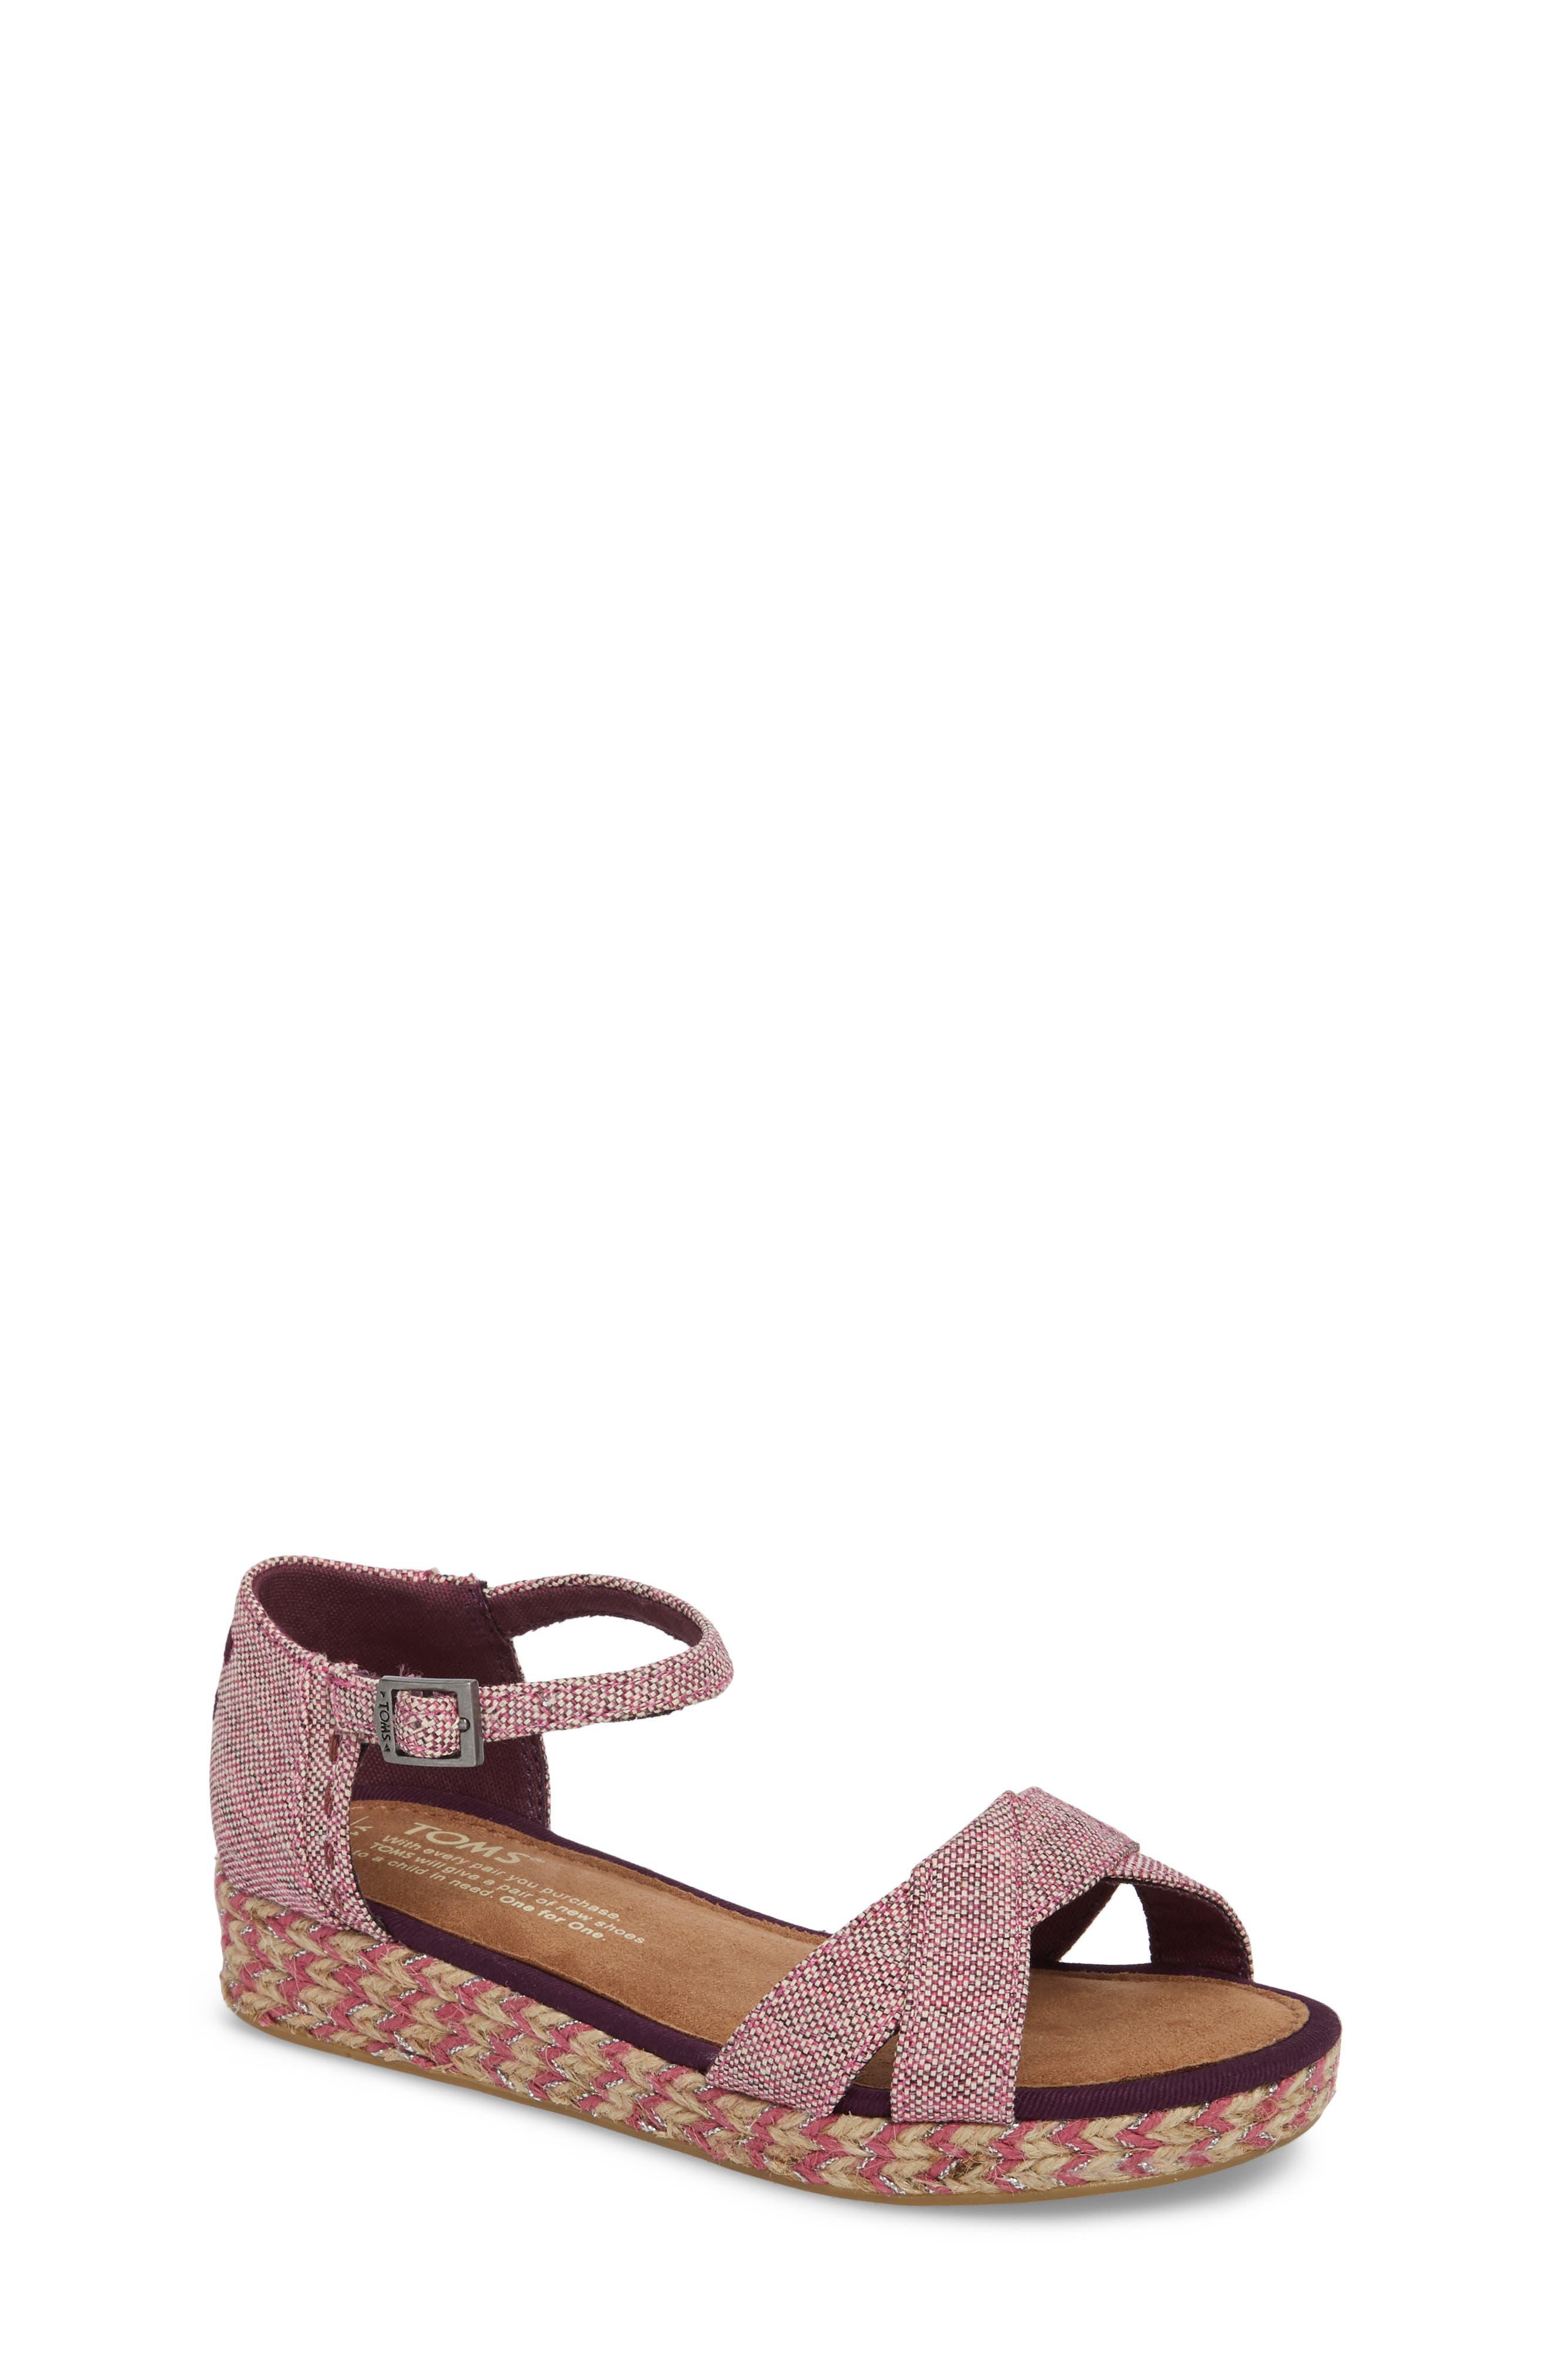 Harper Wedge Sandal,                         Main,                         color, Plum Oxford Melange